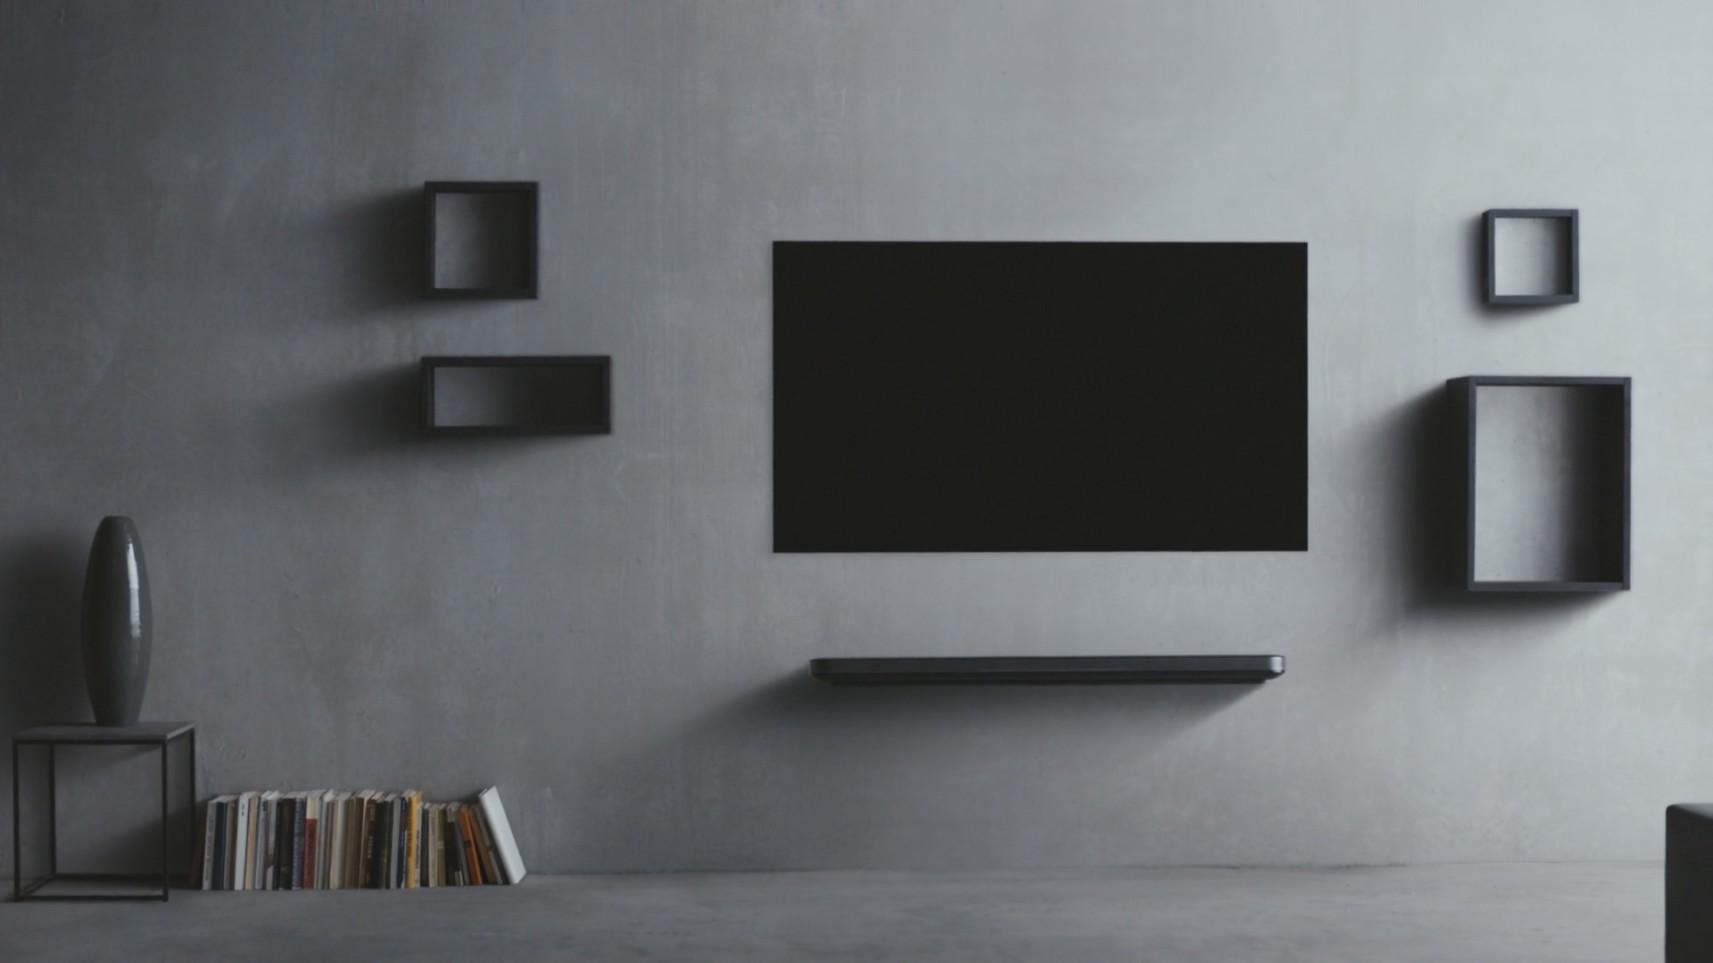 commercial: lg w7 - mam.art, slovenian production design company